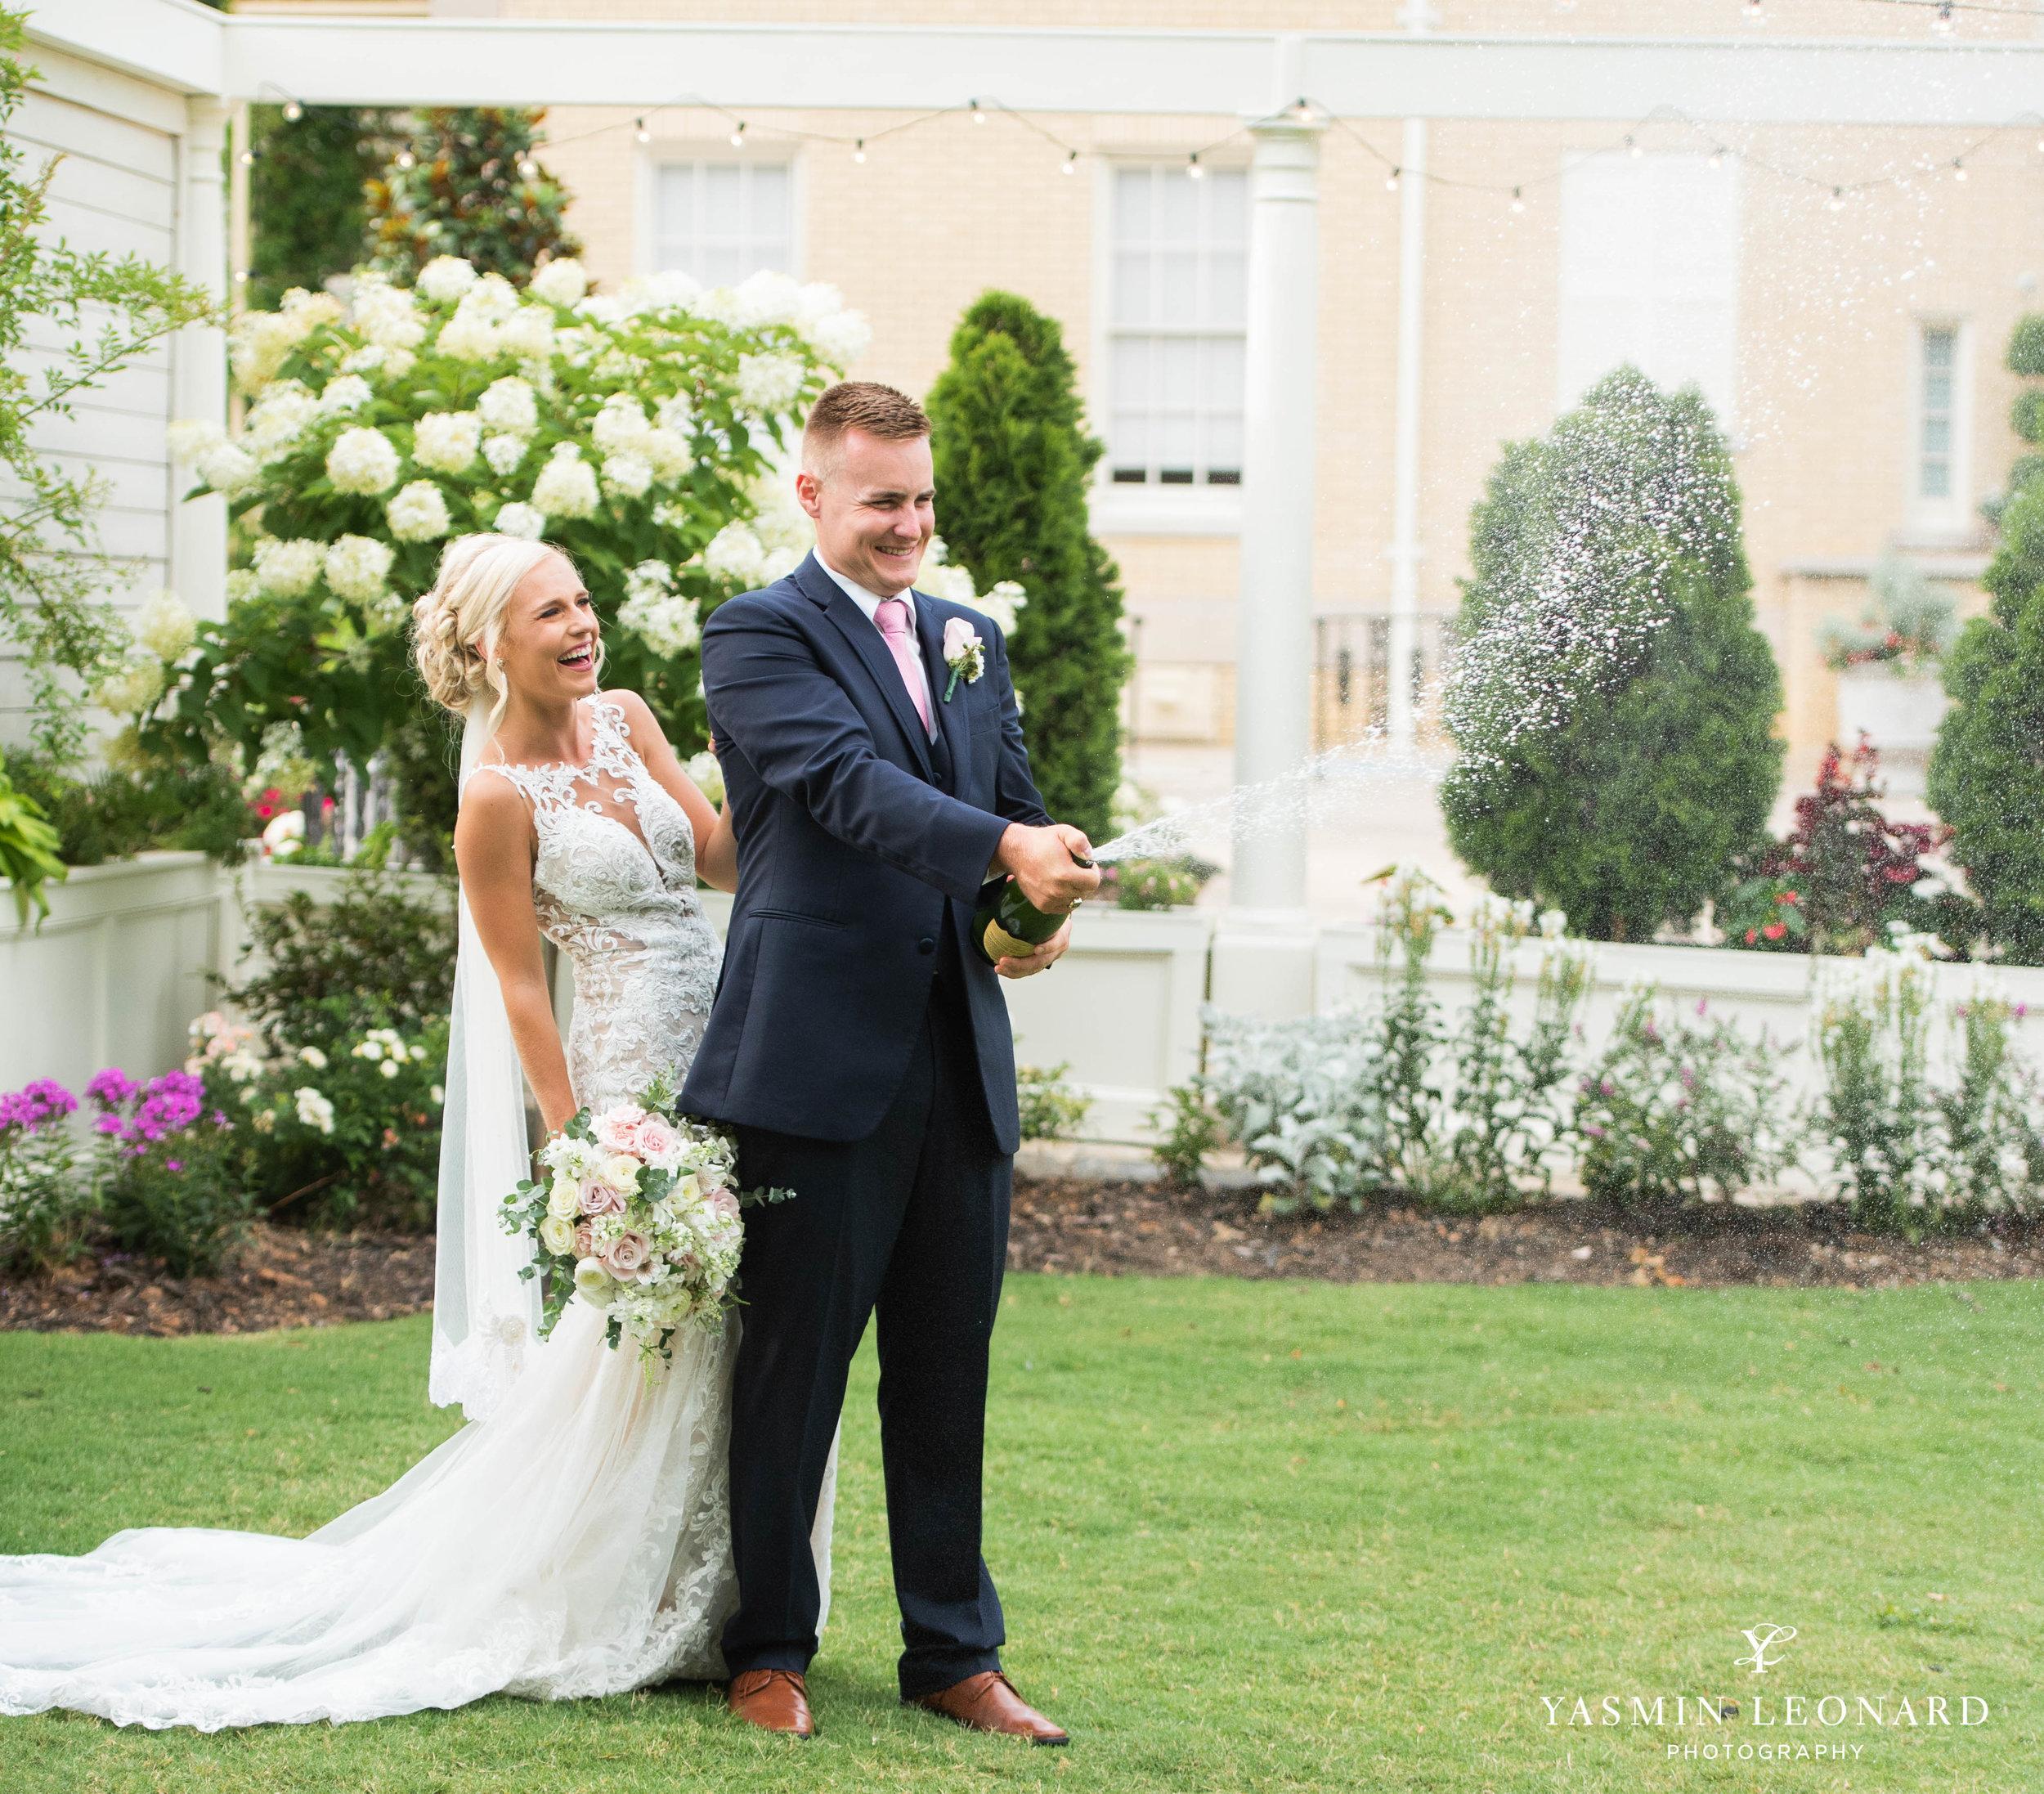 Separk Mansion - NC Weddings - Gastonia Wedding - NC Wedding Venues - Pink and Blue Wedding Ideas - Pink Bridesmaid Dresses - Yasmin Leonard Photography-31.jpg